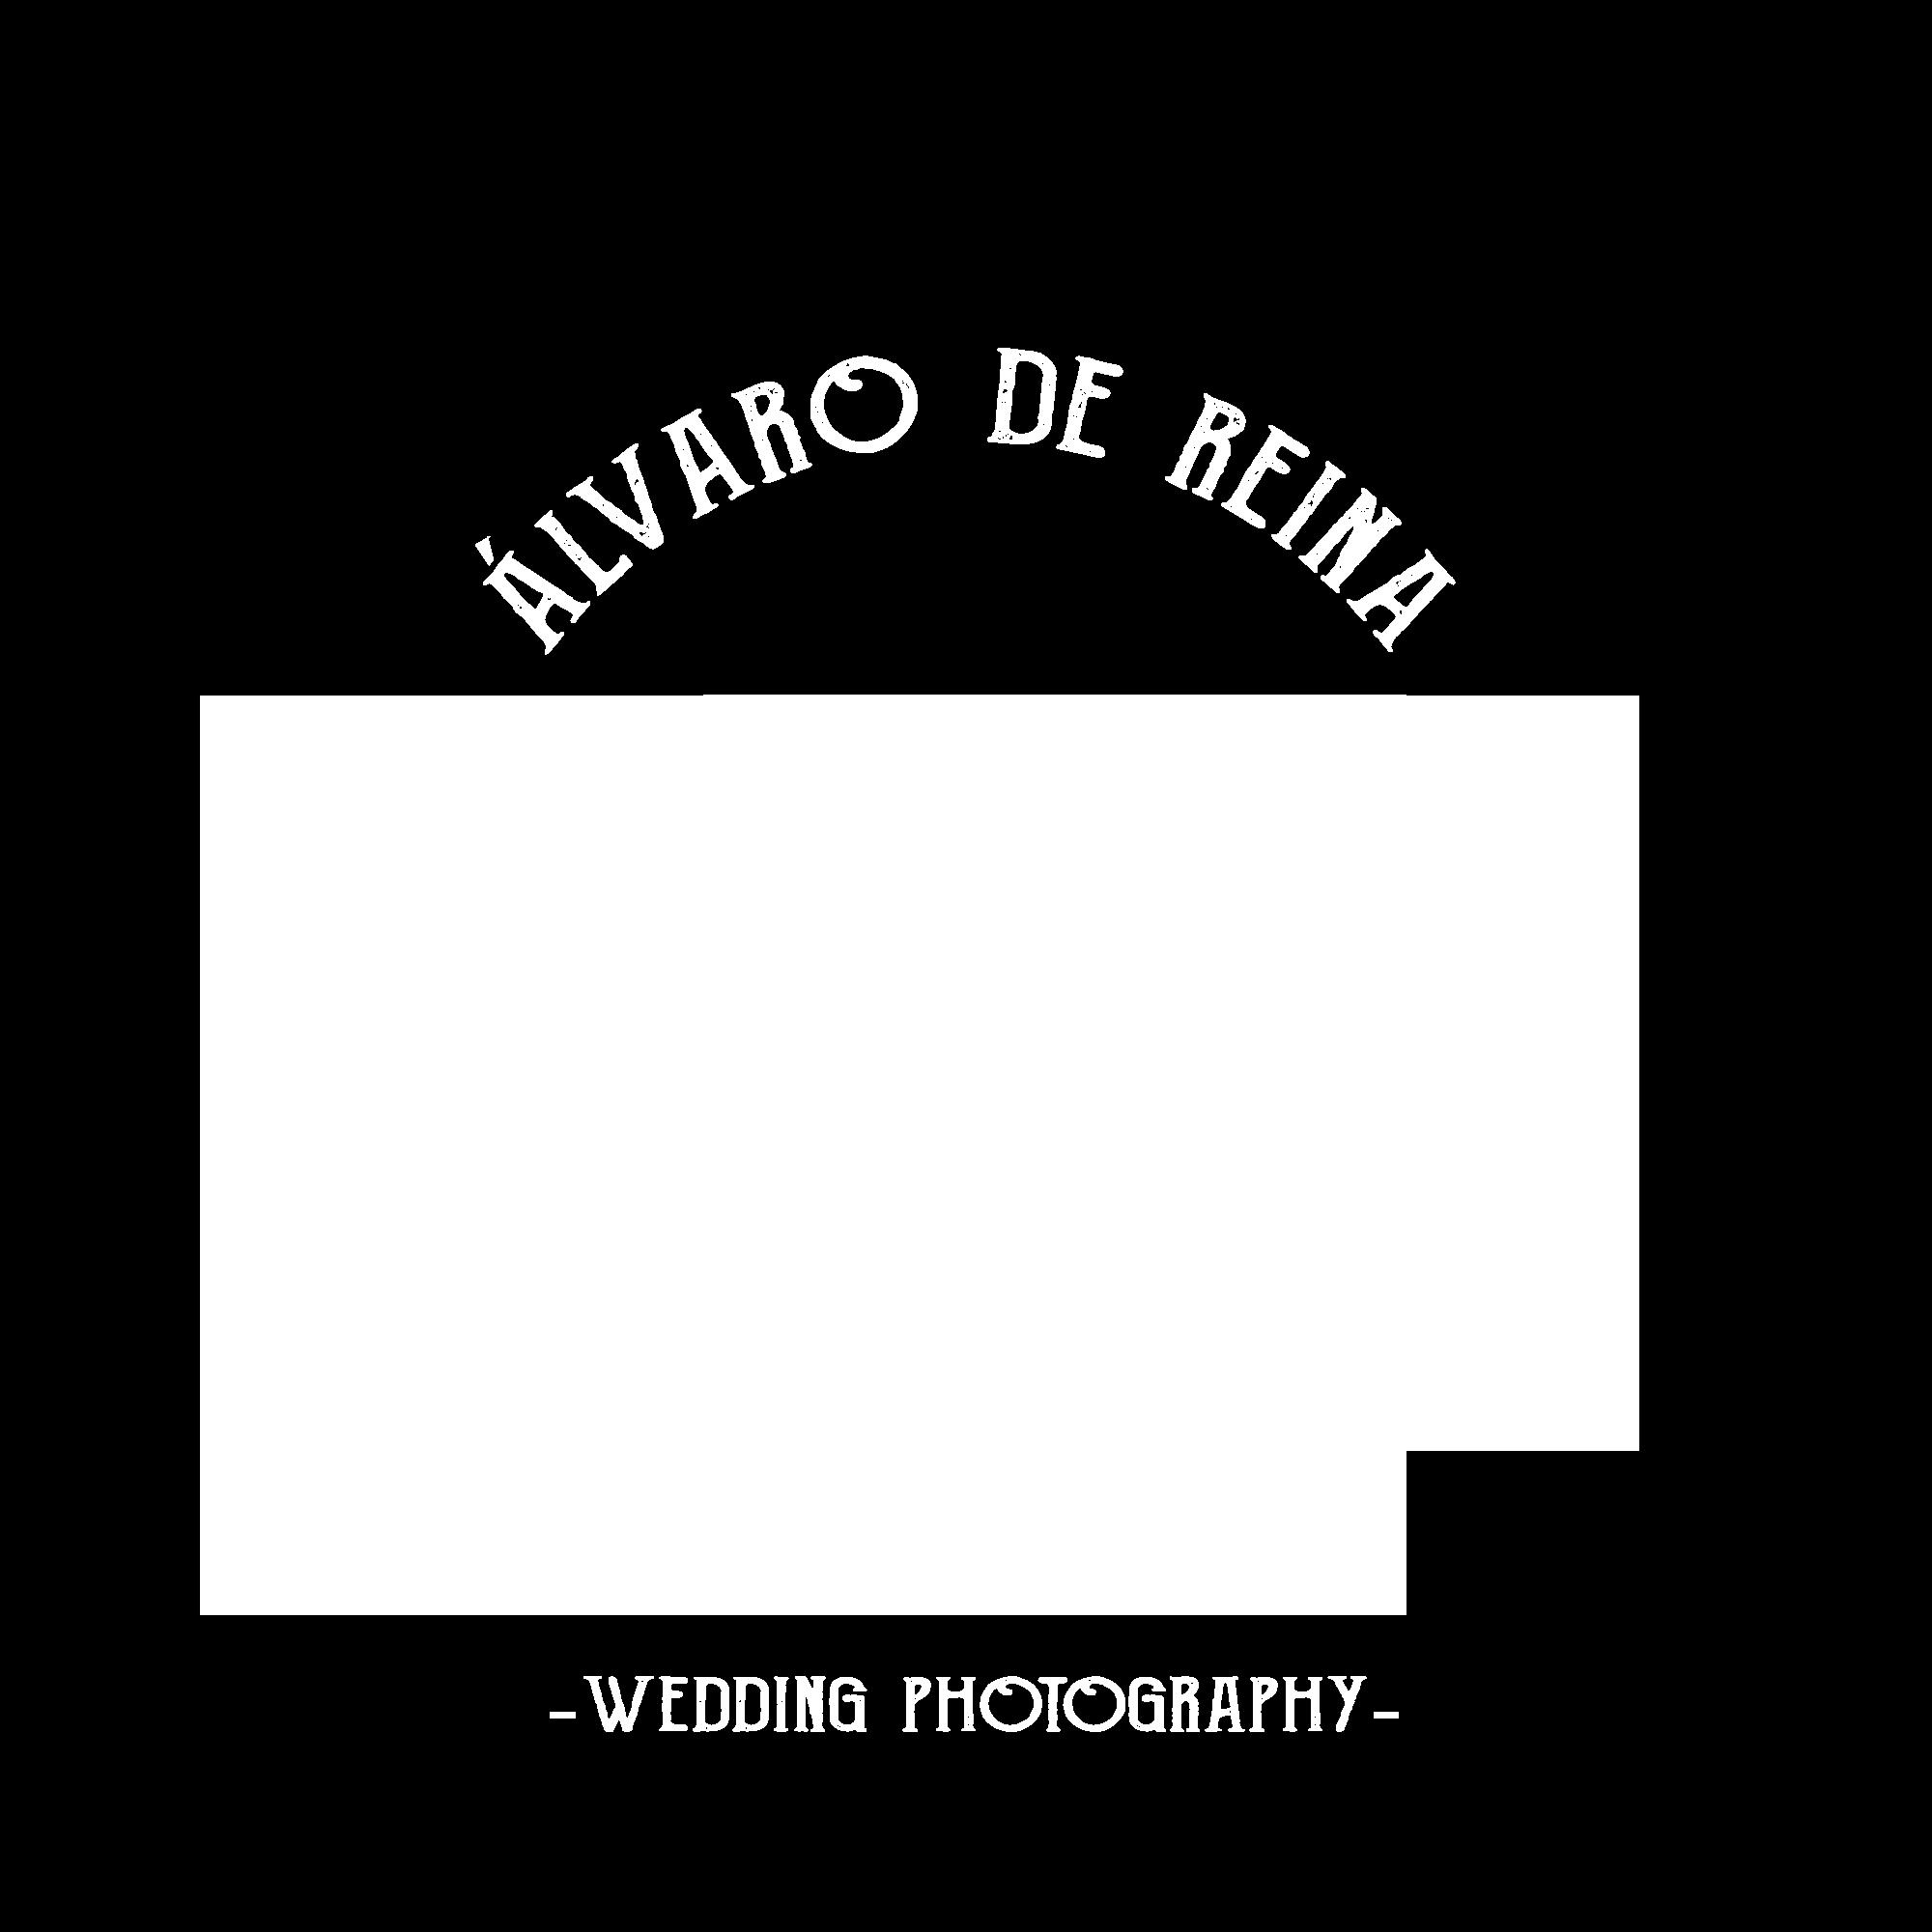 Álvaro de Reina - Fotografía de Boda